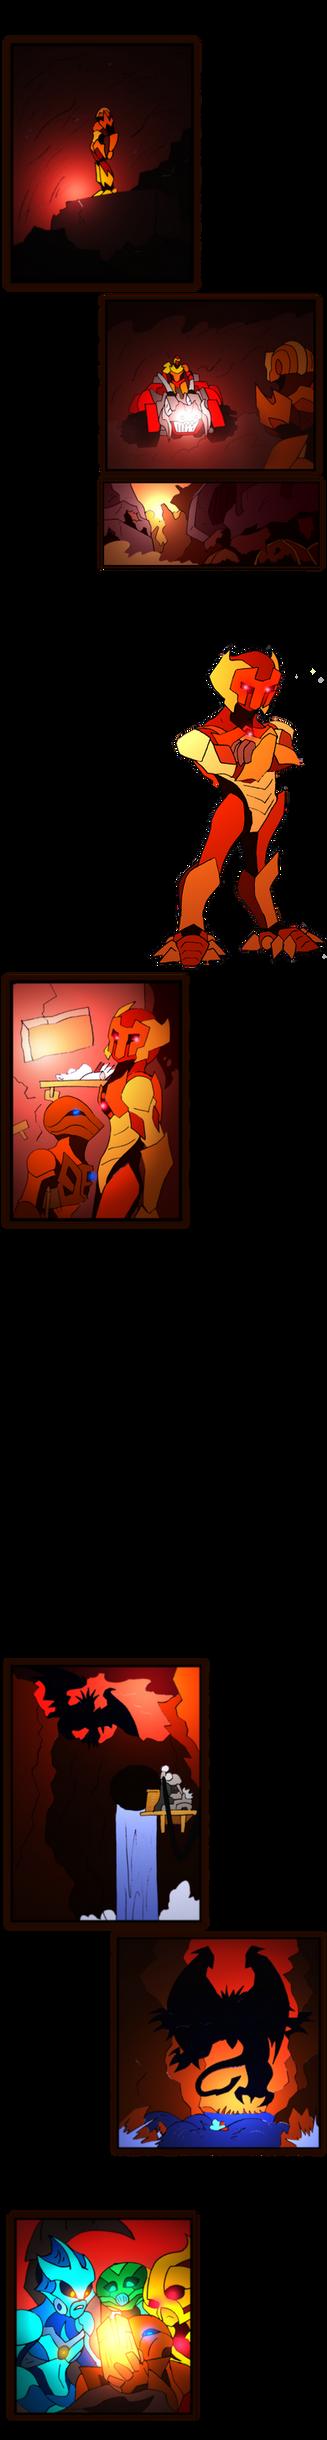 Bionicle- Nova Orbis- Mystery- Chapter 9 by NickinAmerica